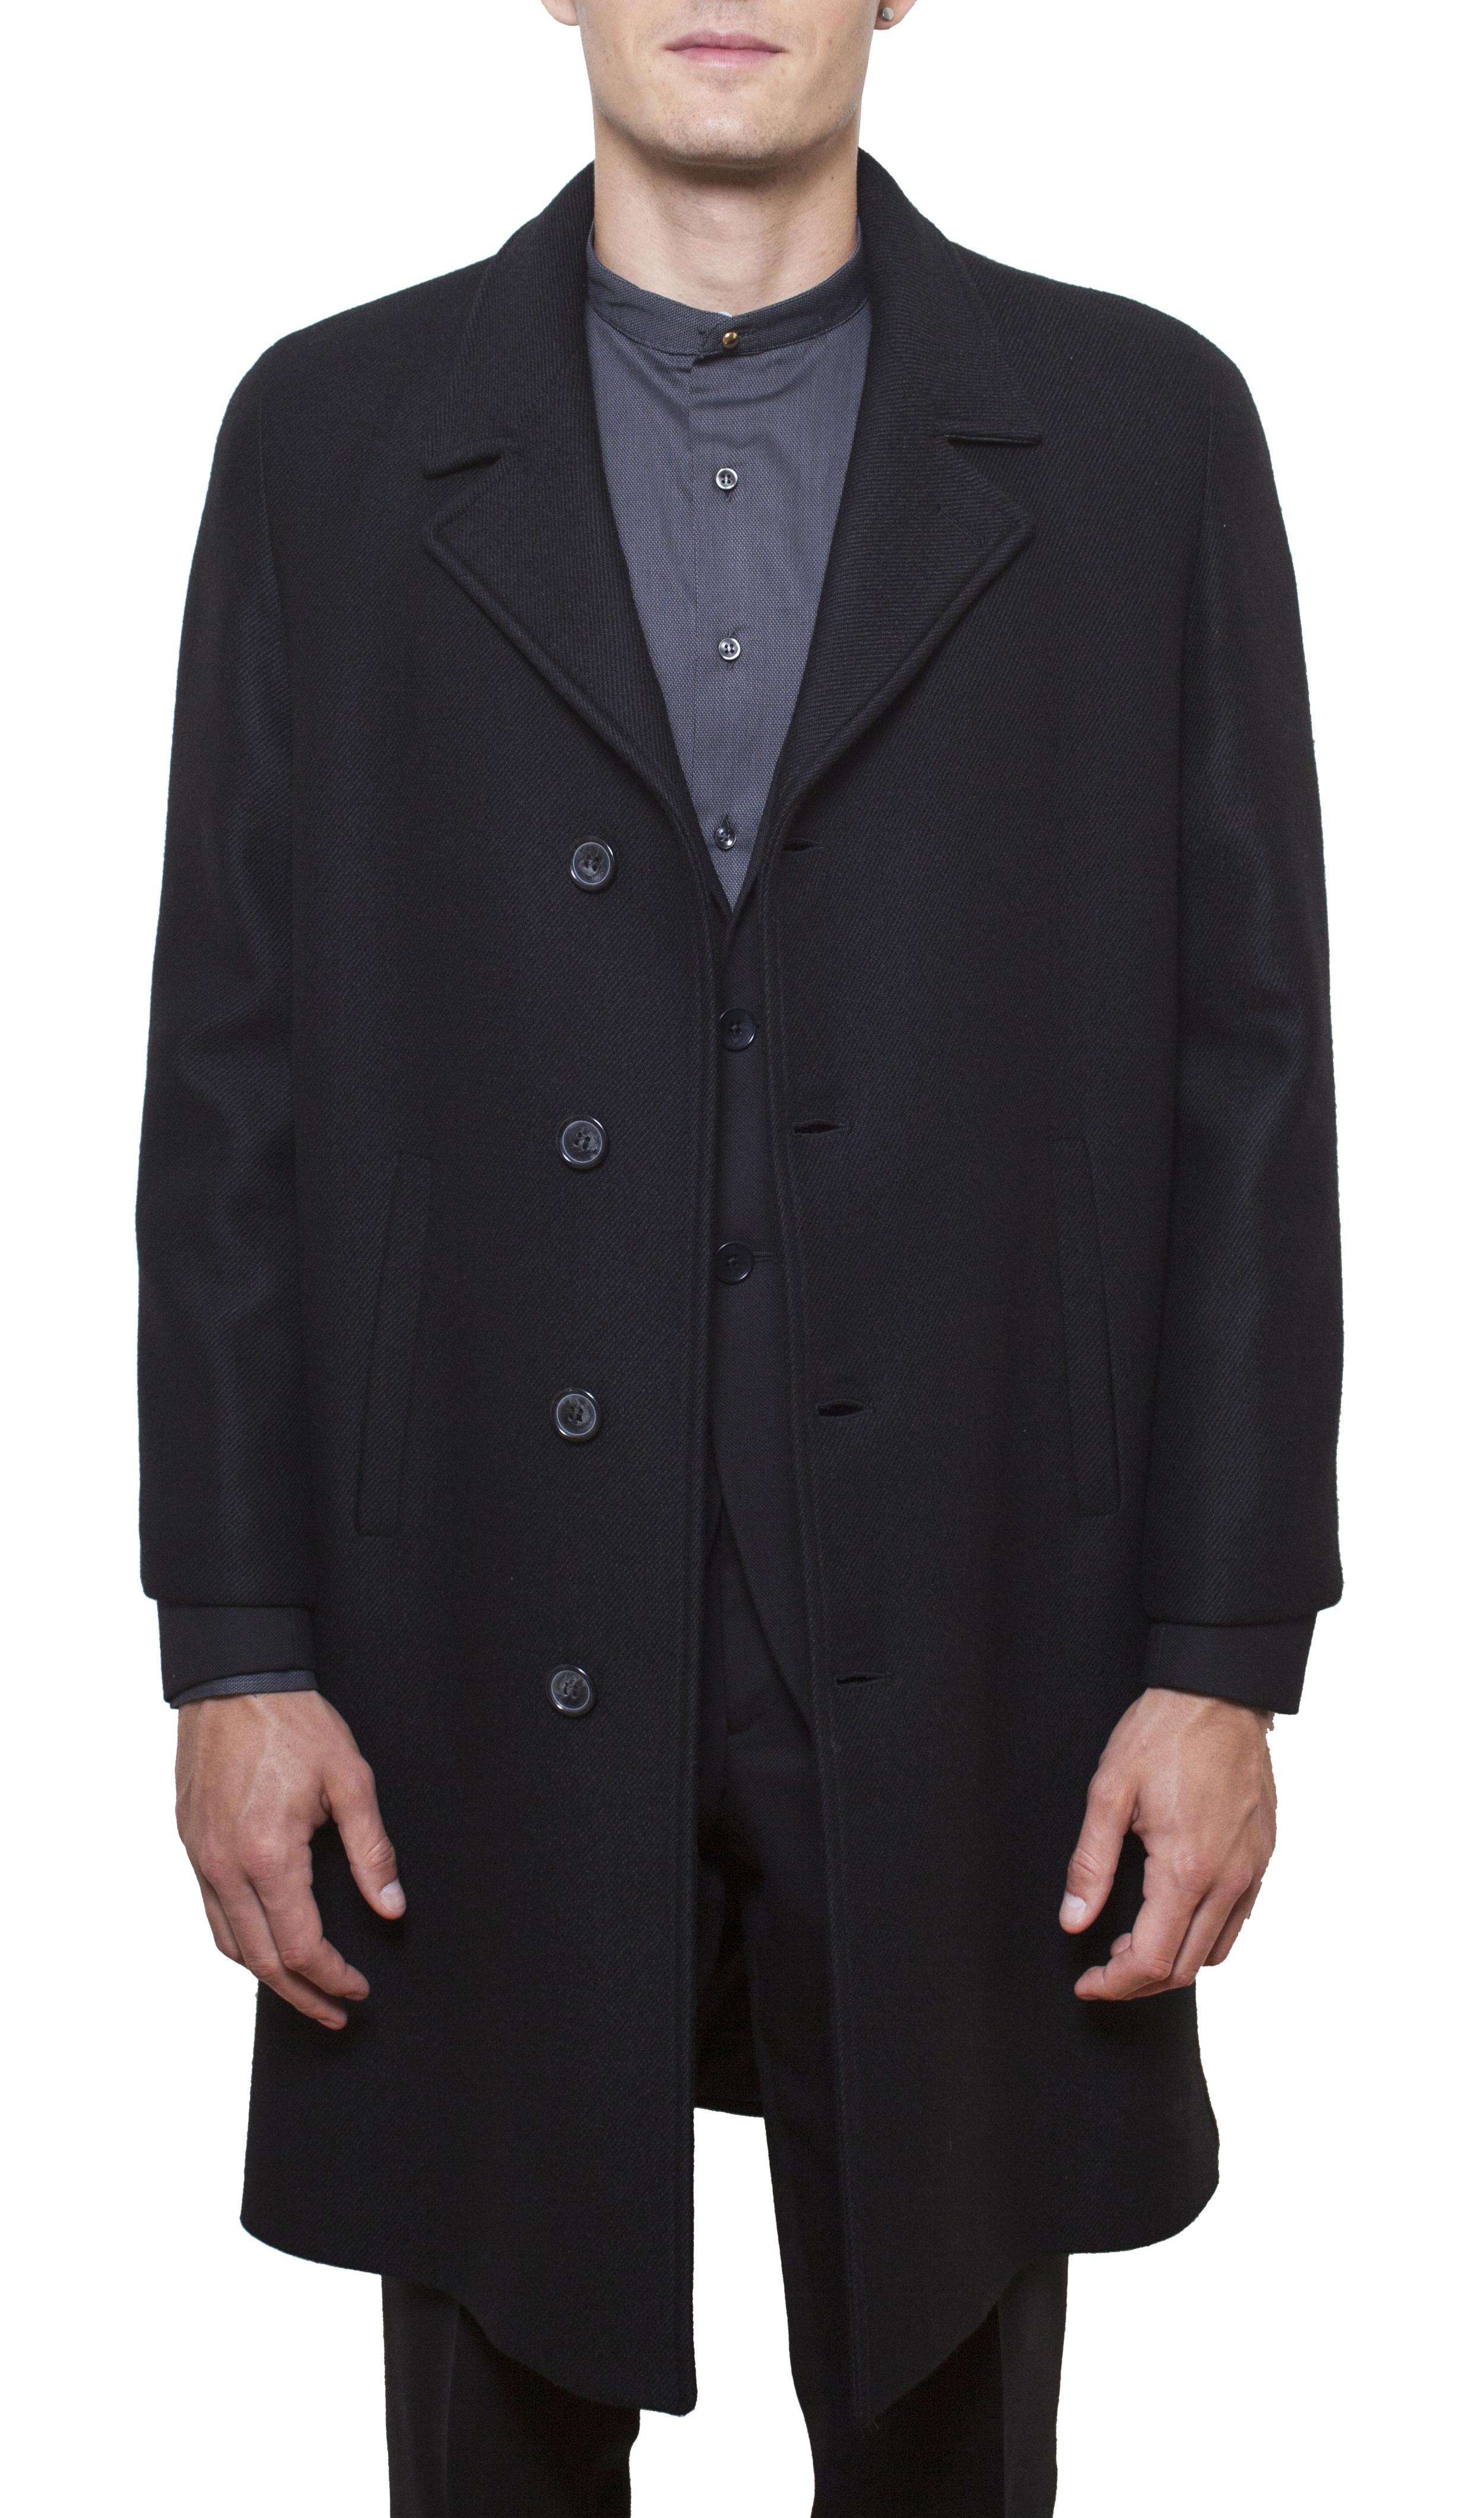 coatBLACK.jpg